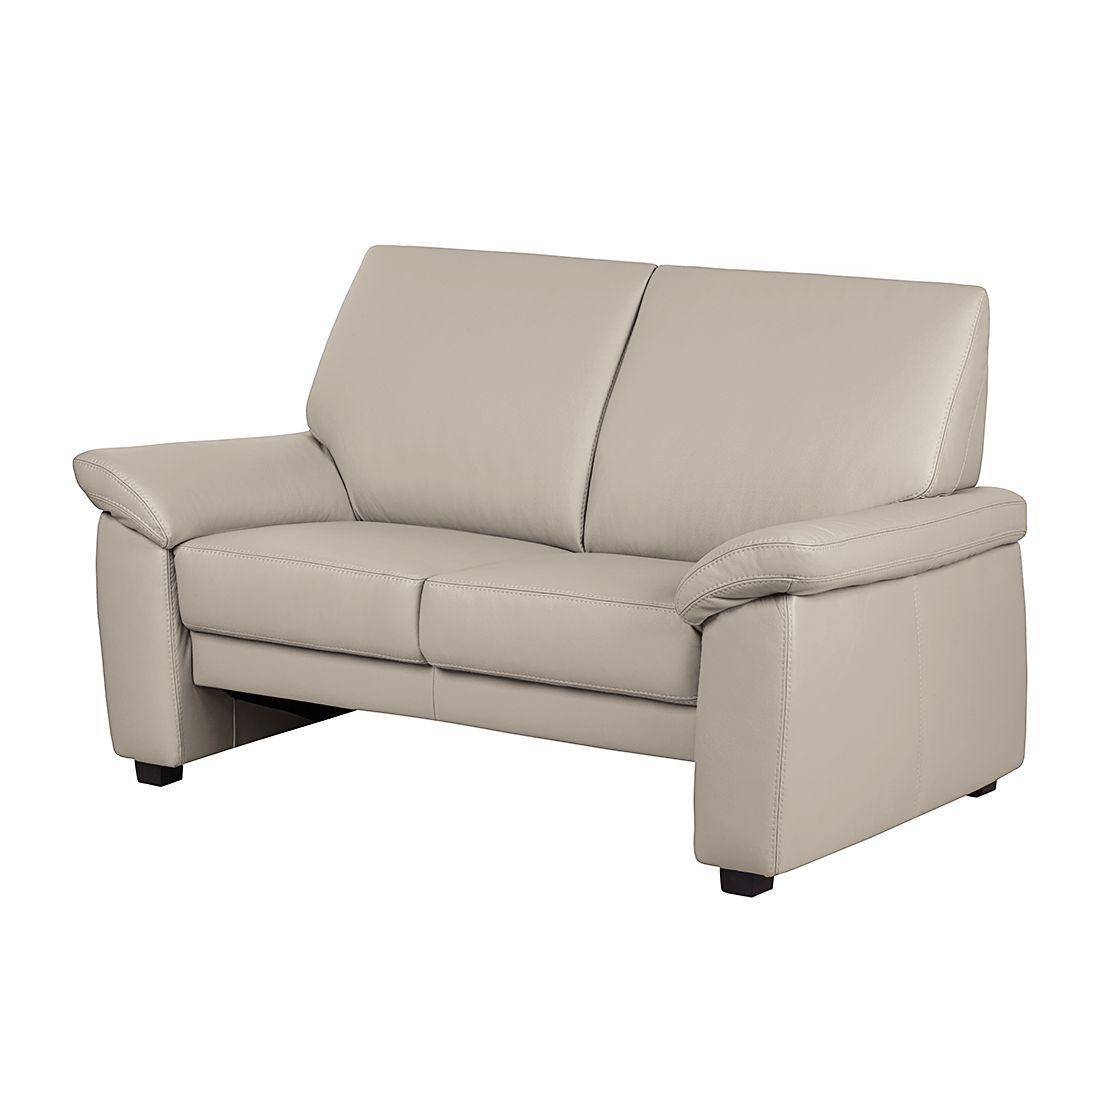 Modoform Sofa Grimsby 2 Sitzer Taupe Echtleder 157x94x92 Cm In 2020 Big Sofa Kaufen Sofa Design Sofa Leder